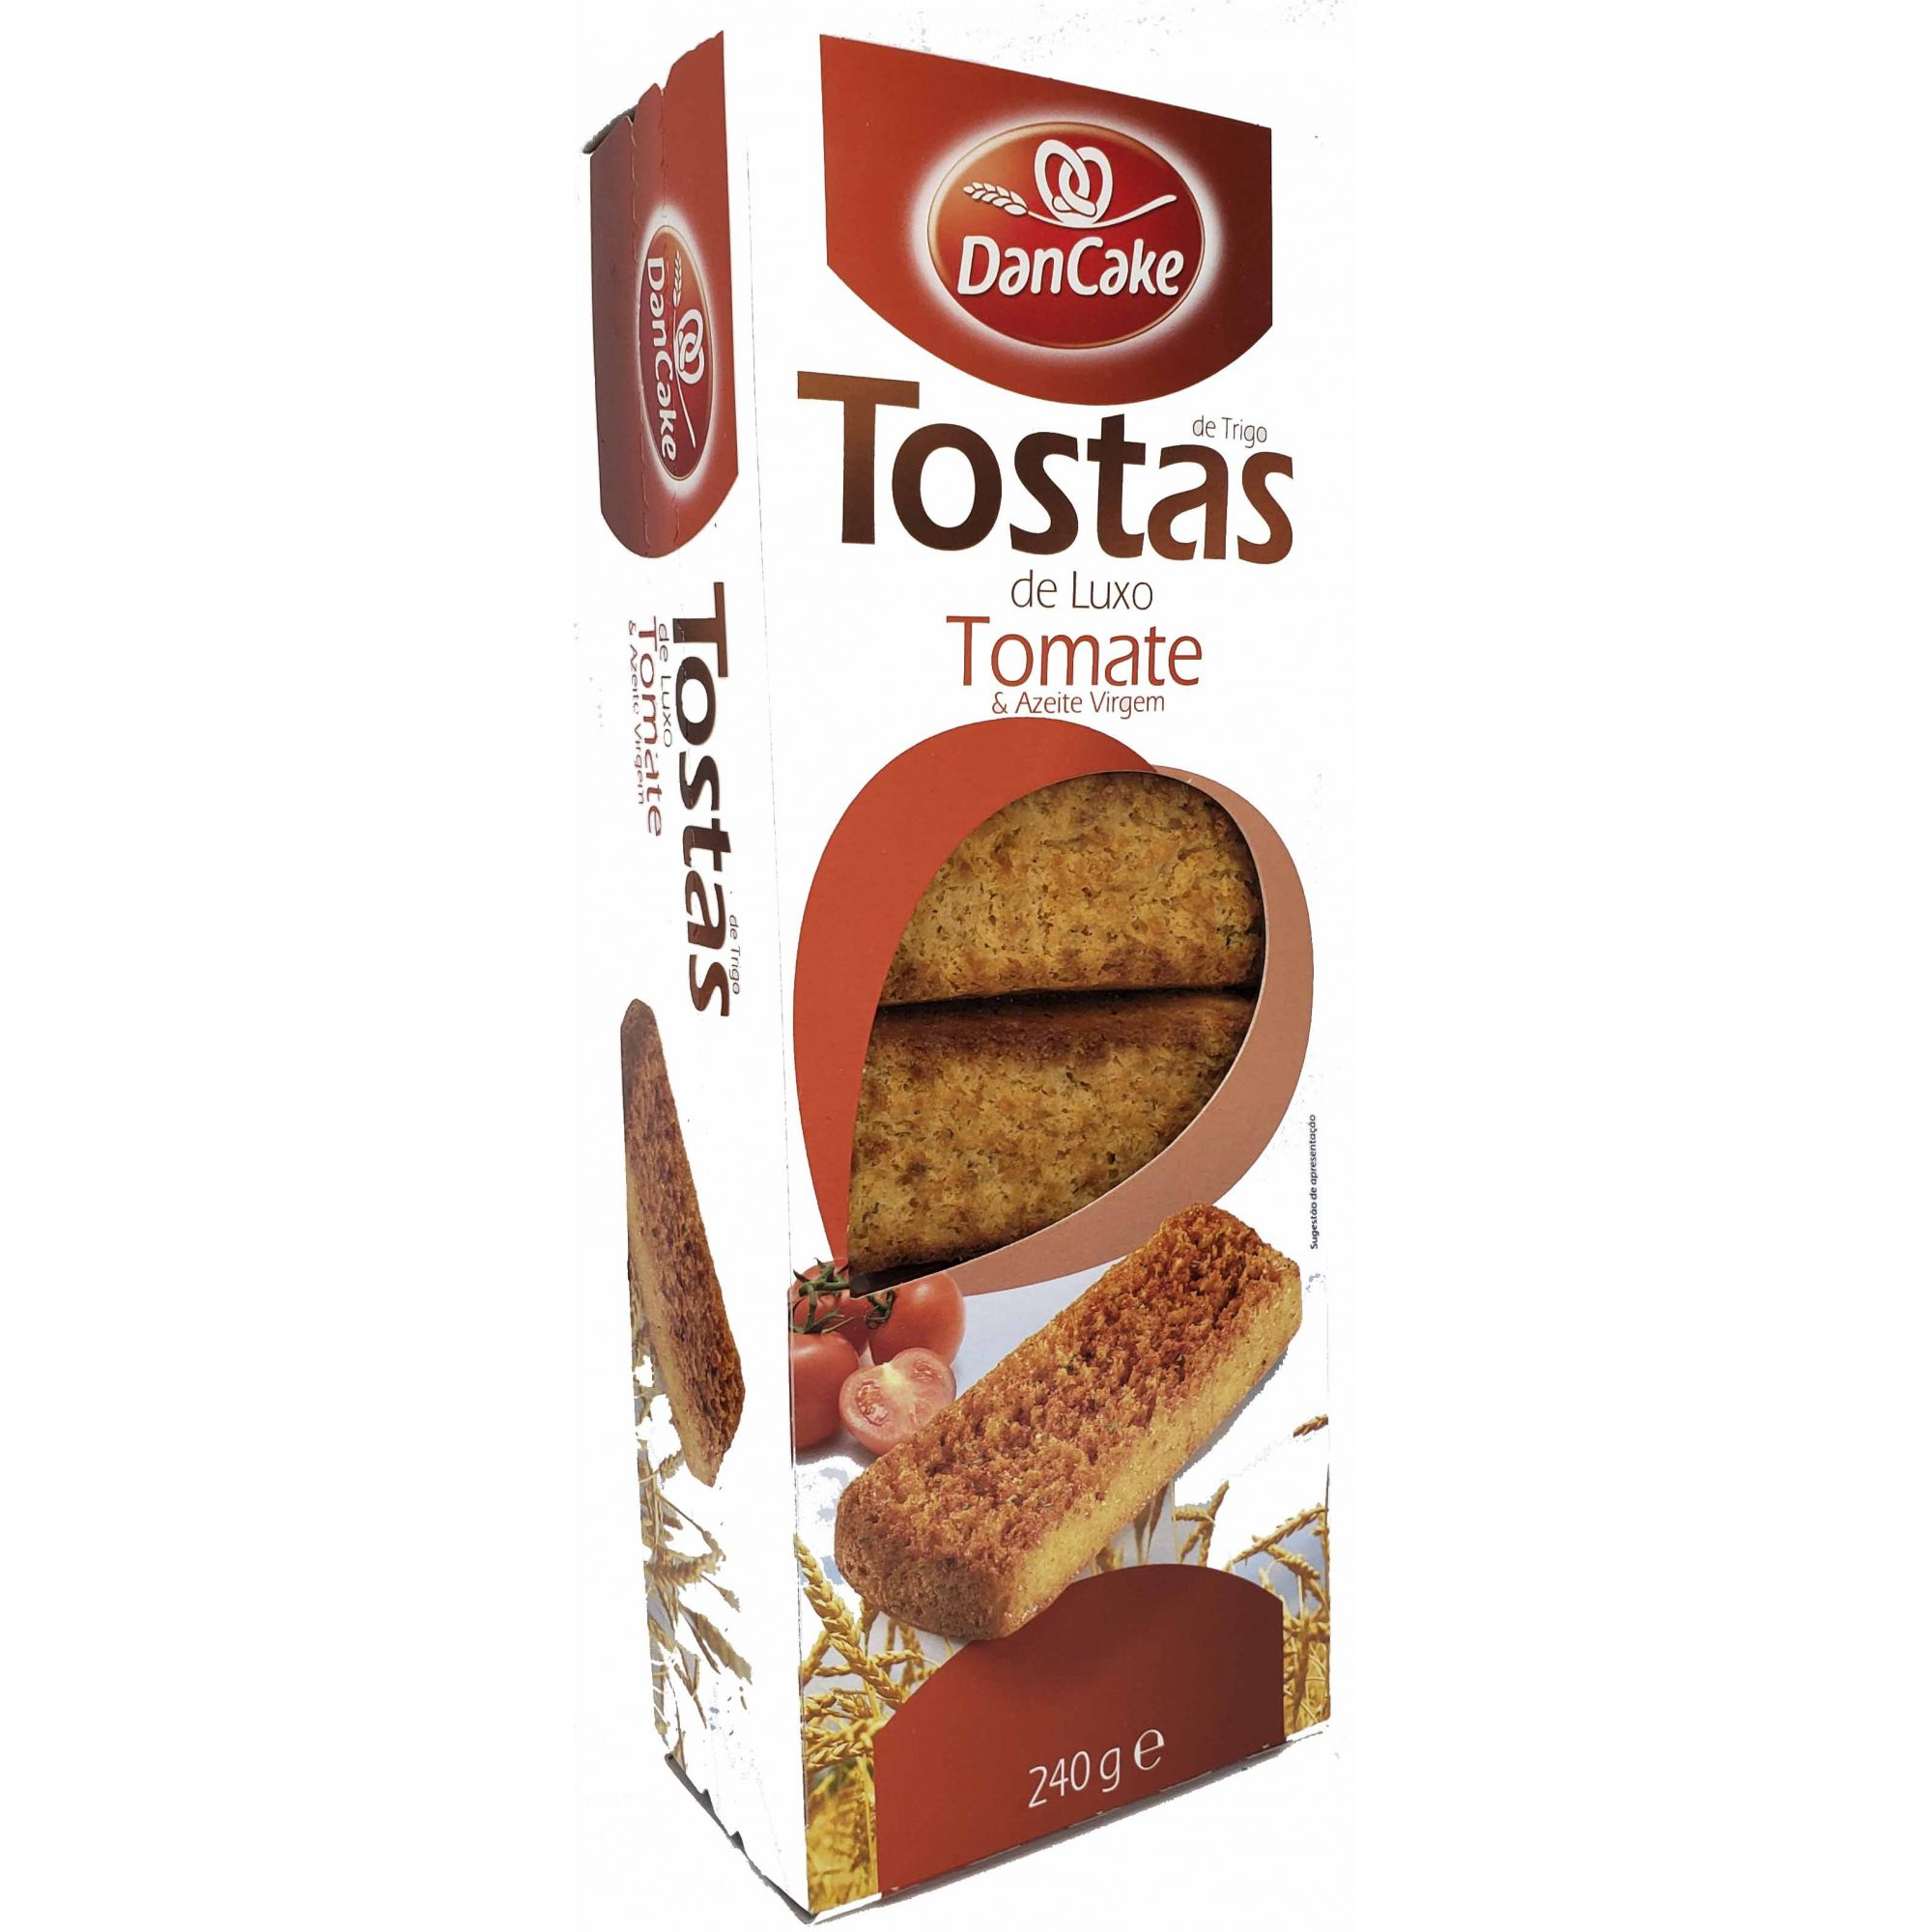 Tostas de Tomate DanCake - 240g -